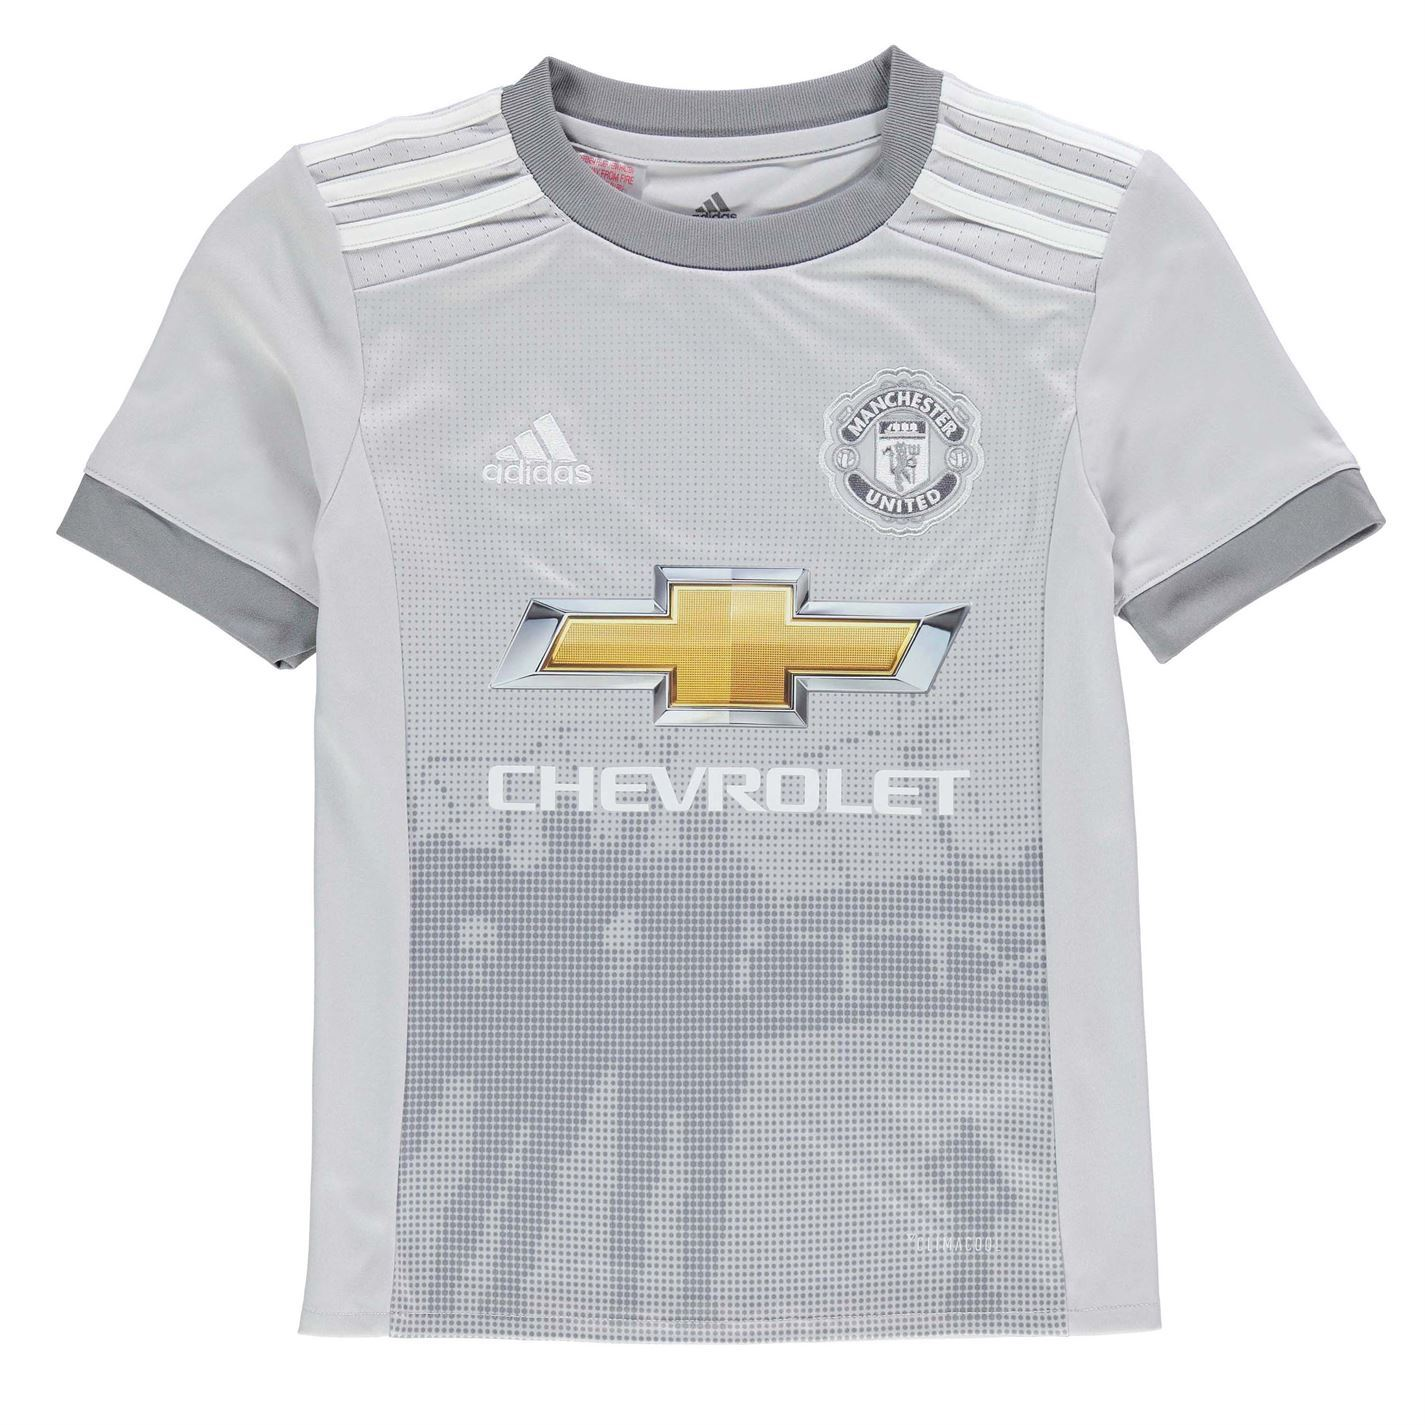 timeless design f1703 79219 Details about adidas Manchester United Third Jersey 2017 2018 Juniors Grey  Football Soccer Top